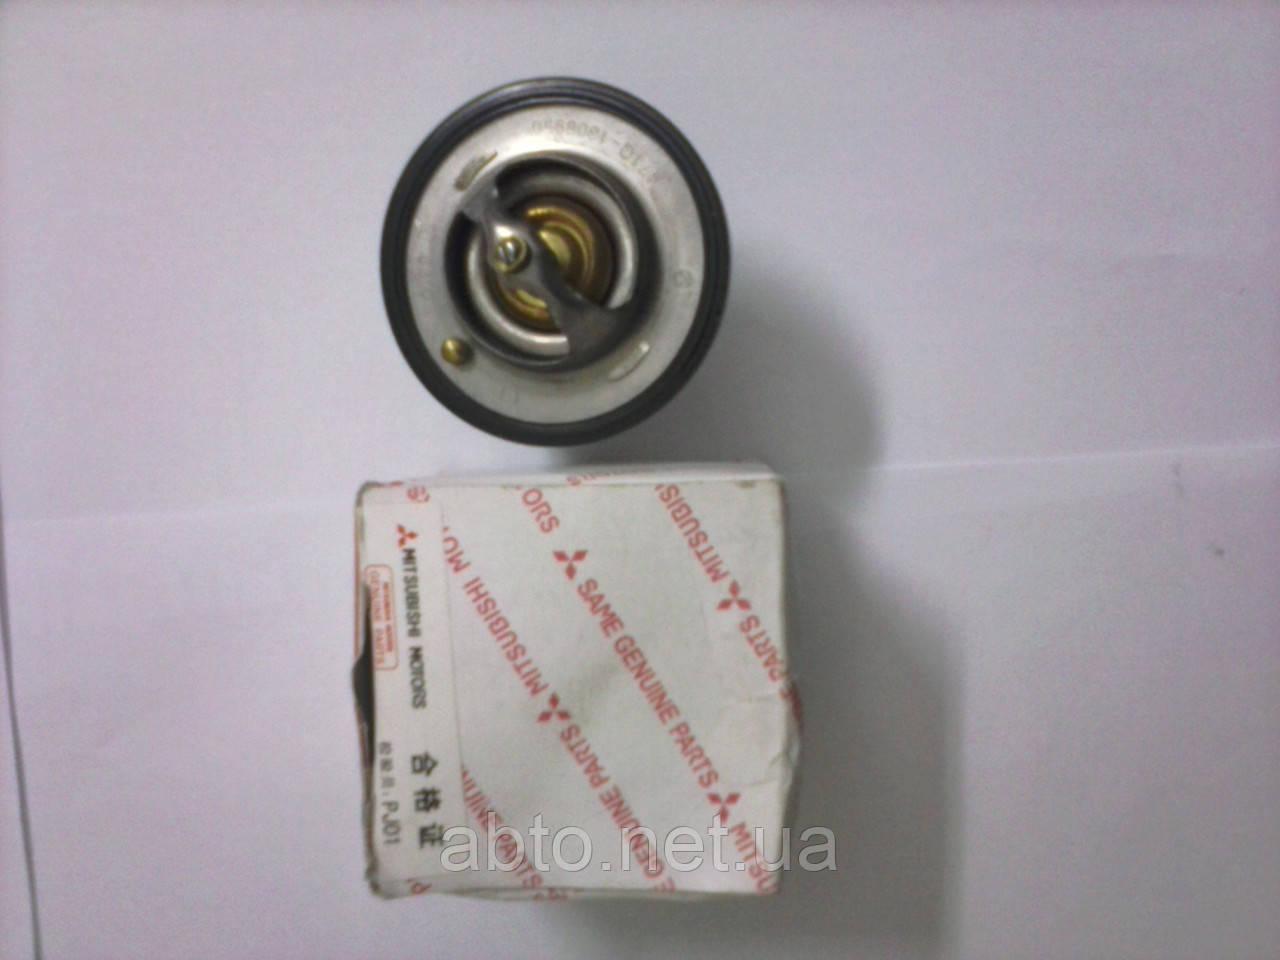 Термостат BYD F3 (БИД Ф3),BYD F3-R (БИД Ф3-Р).